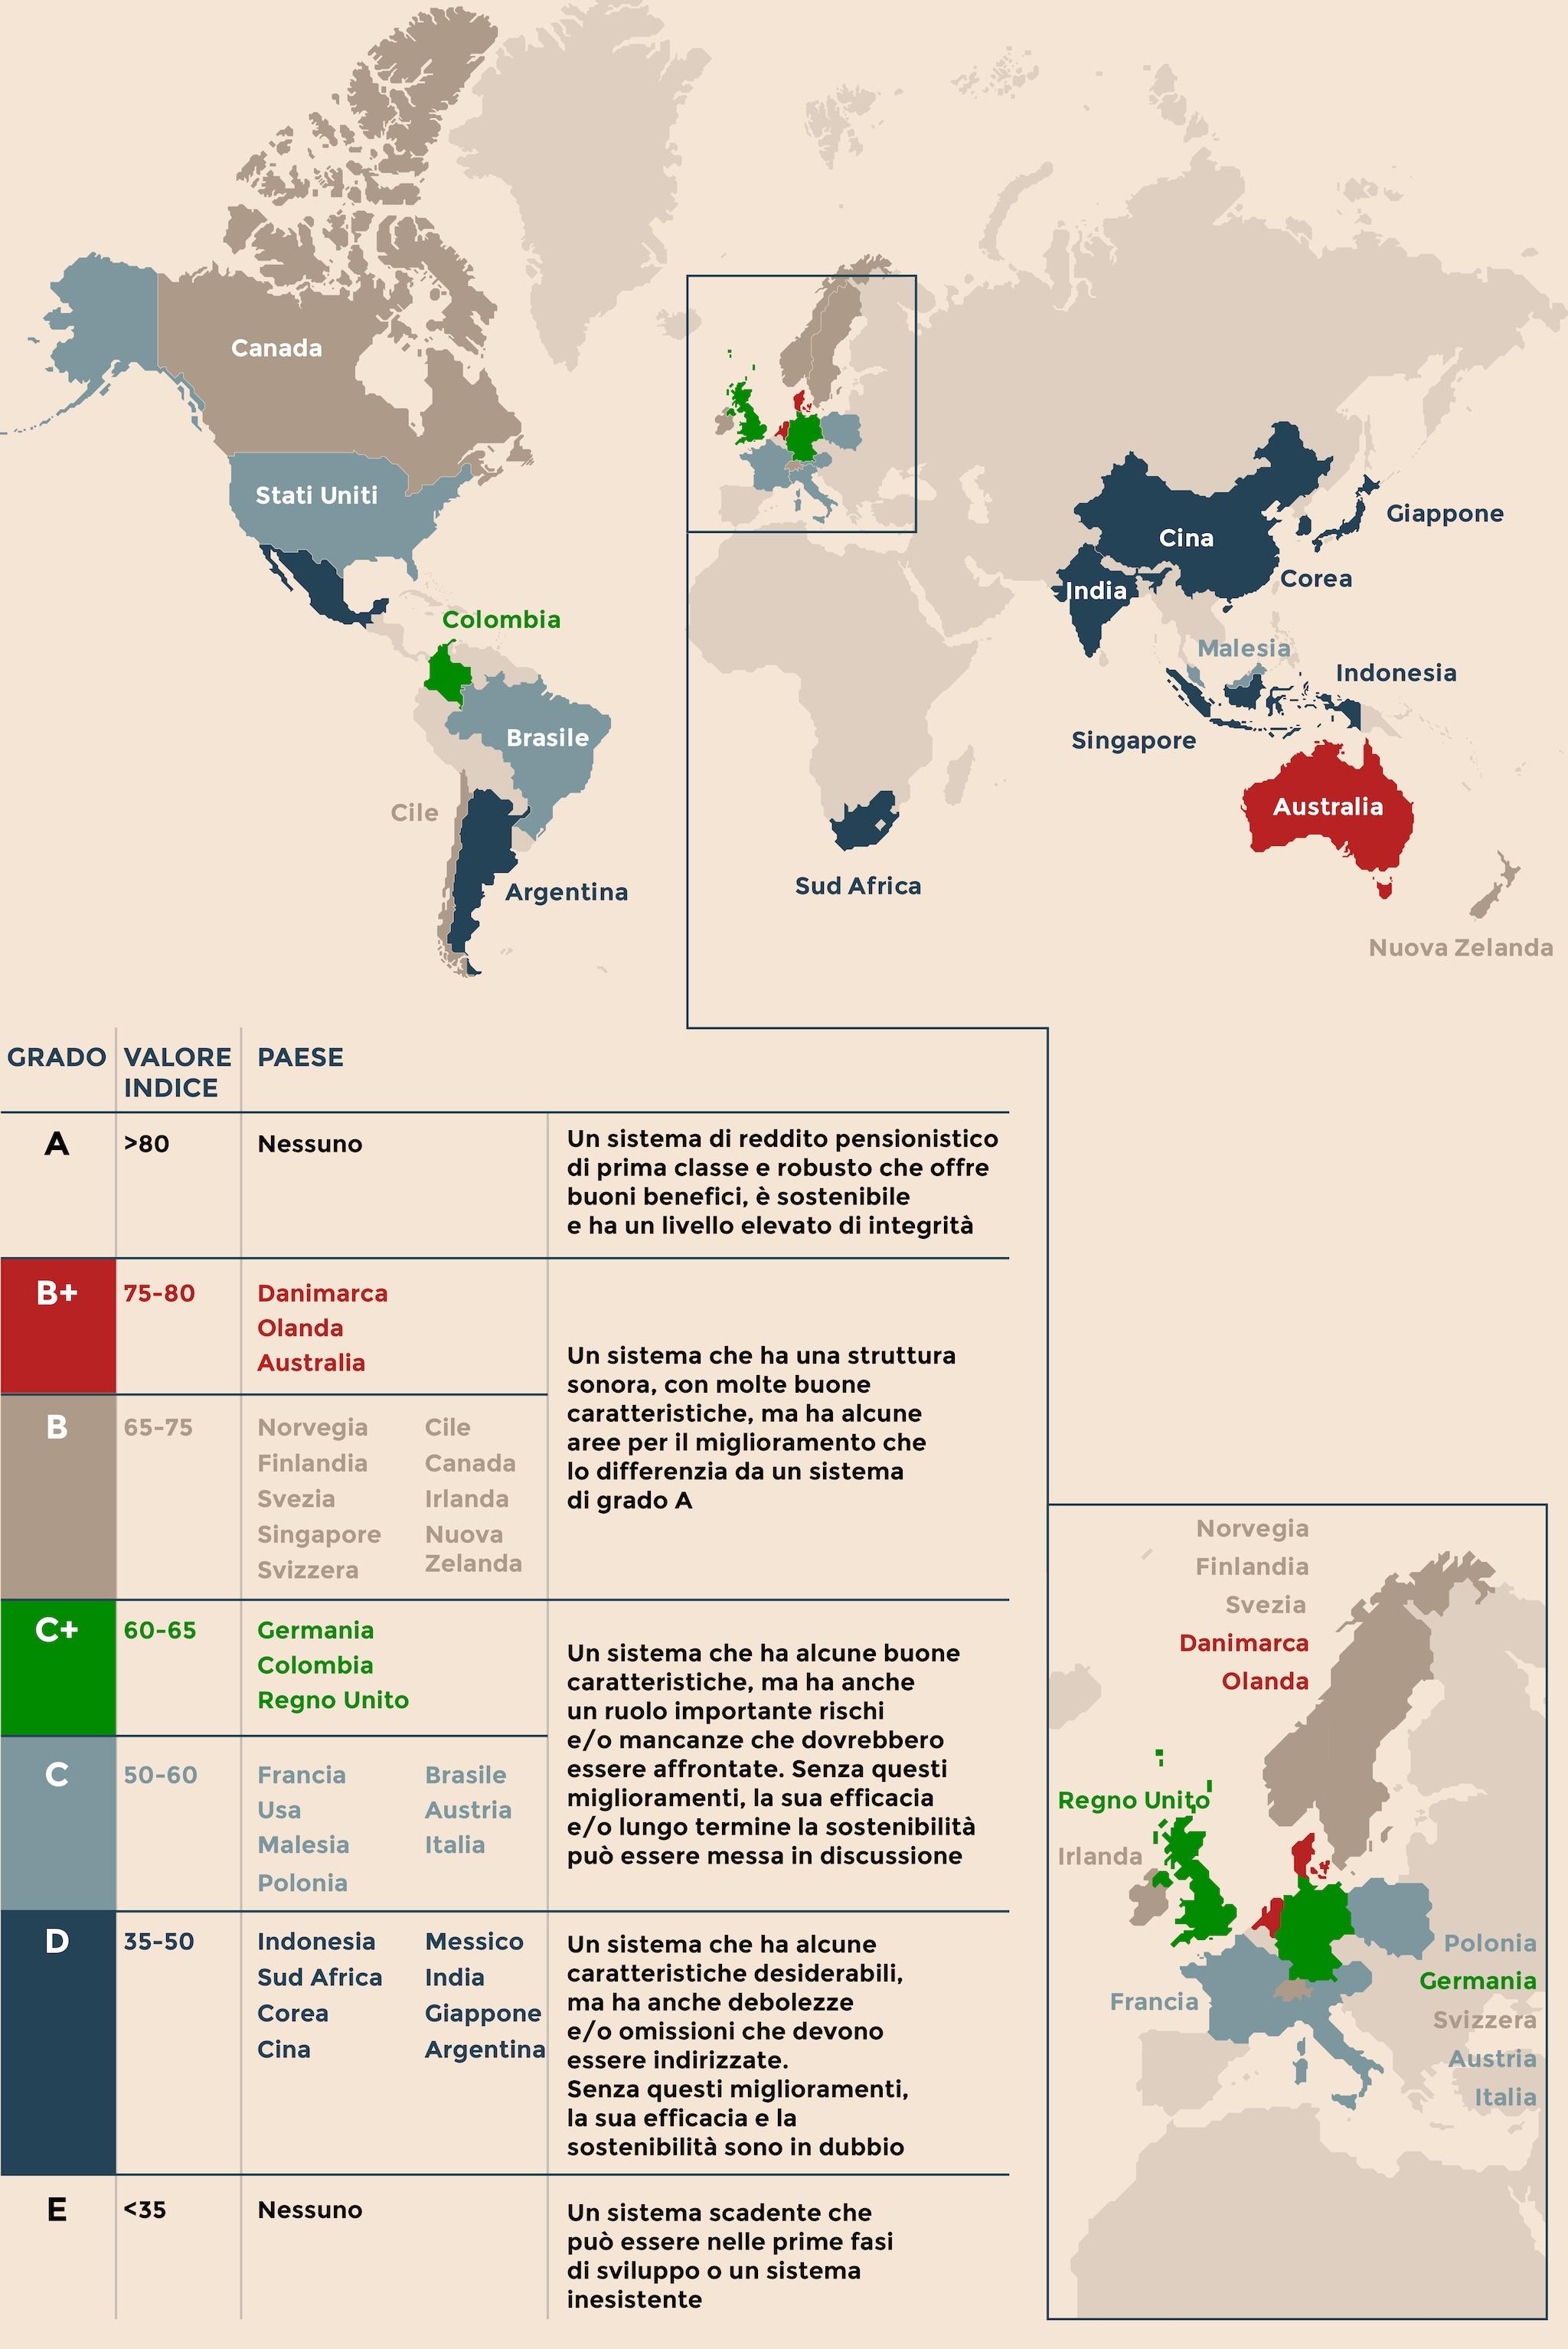 GLOBAL GRADES